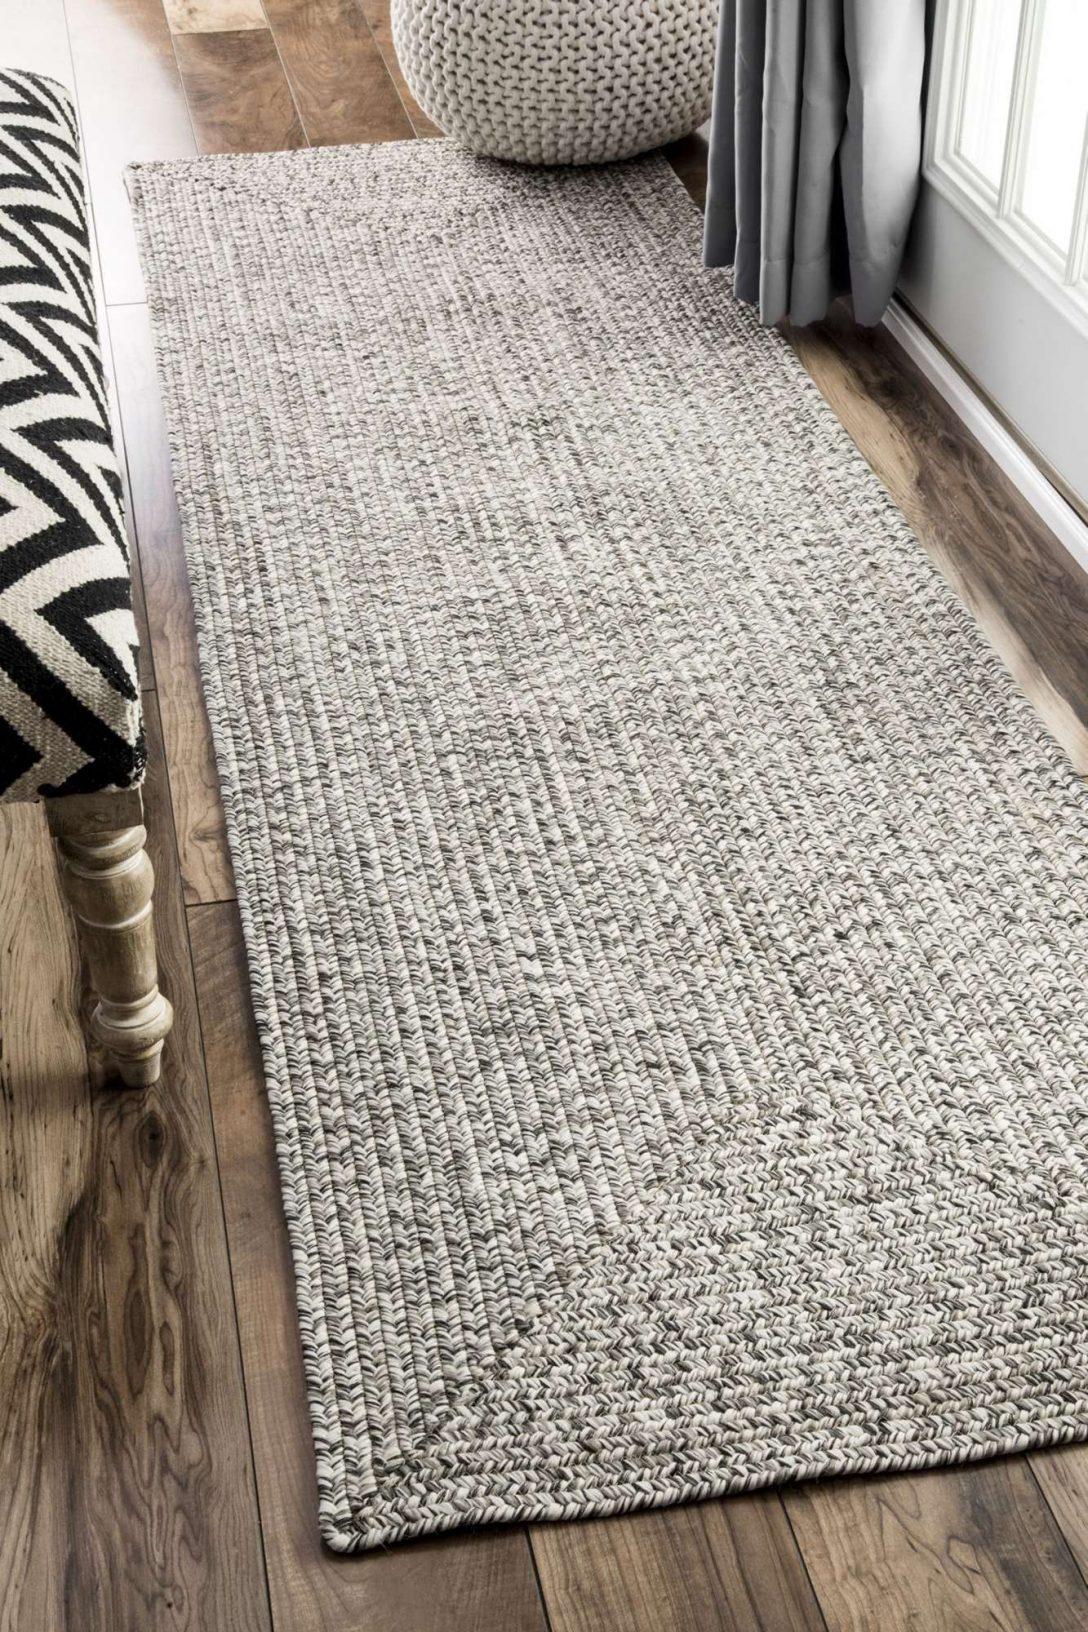 Large Size of Teppich Küche Sinnvoll Teppich Küche Günstig Teppich Küche Waschbar Outdoor Teppich Küche Küche Teppich Küche